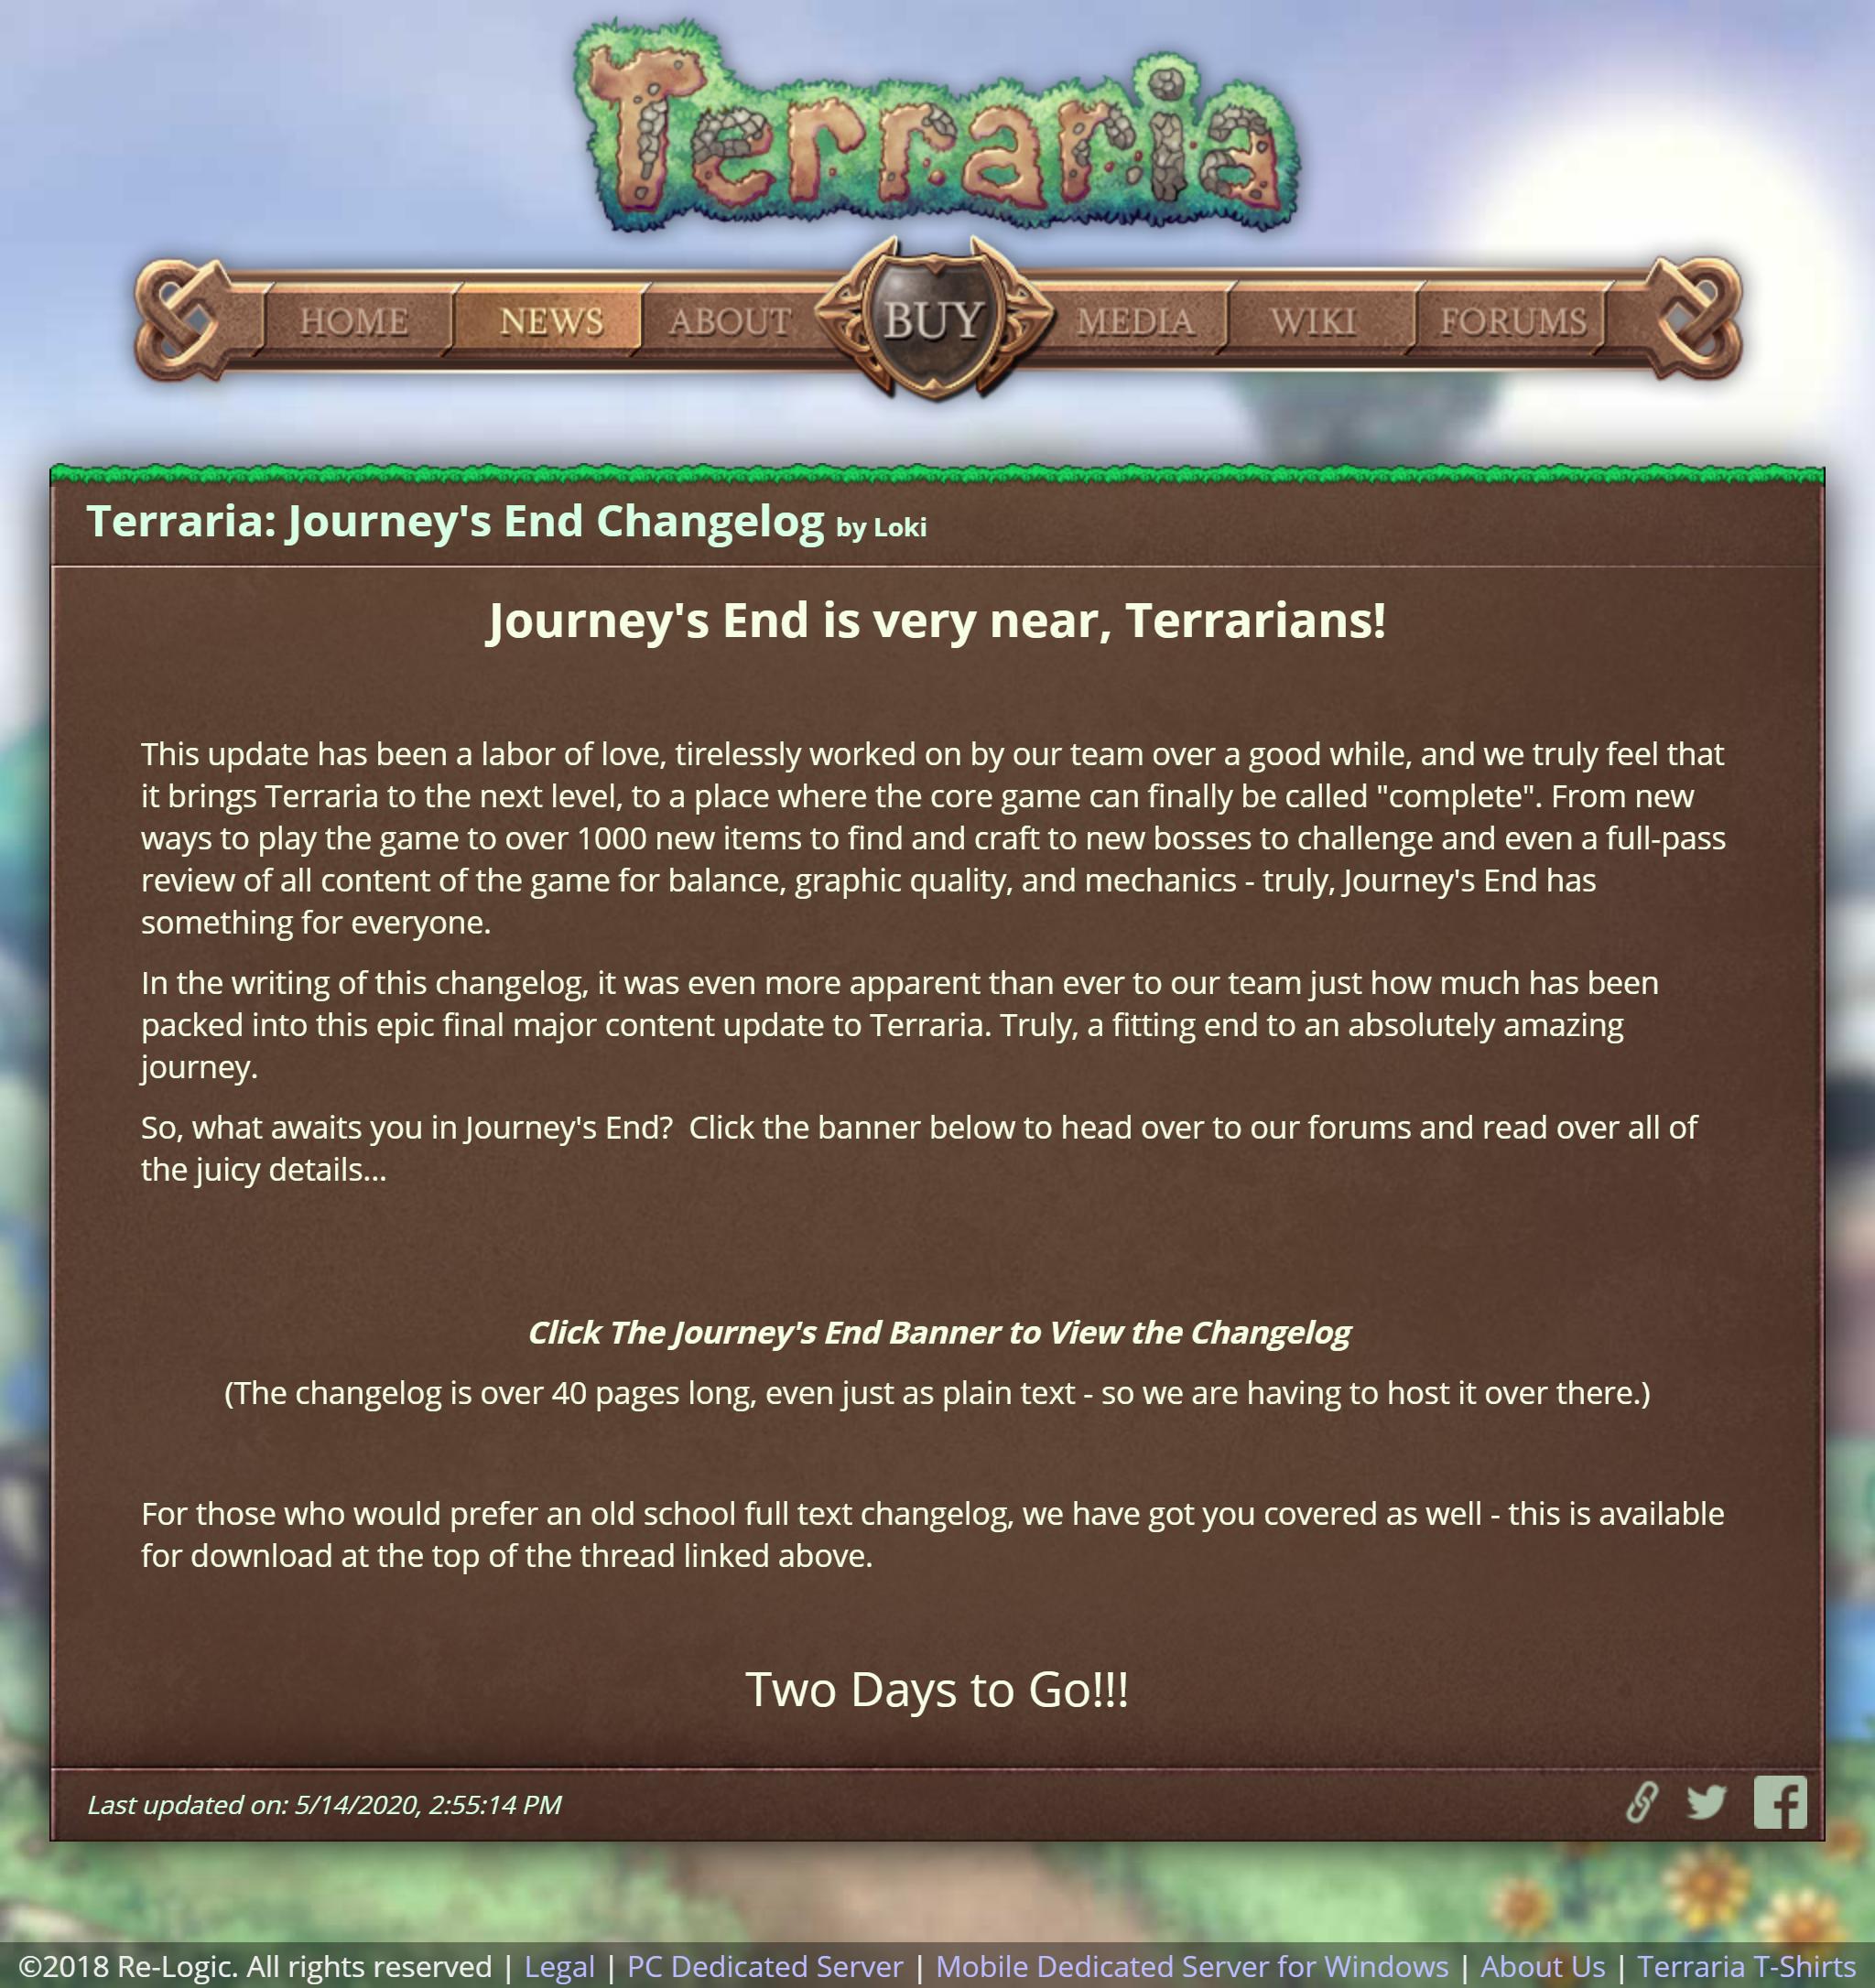 terraria.org_news_terraria-journey-s-end-changelog.png